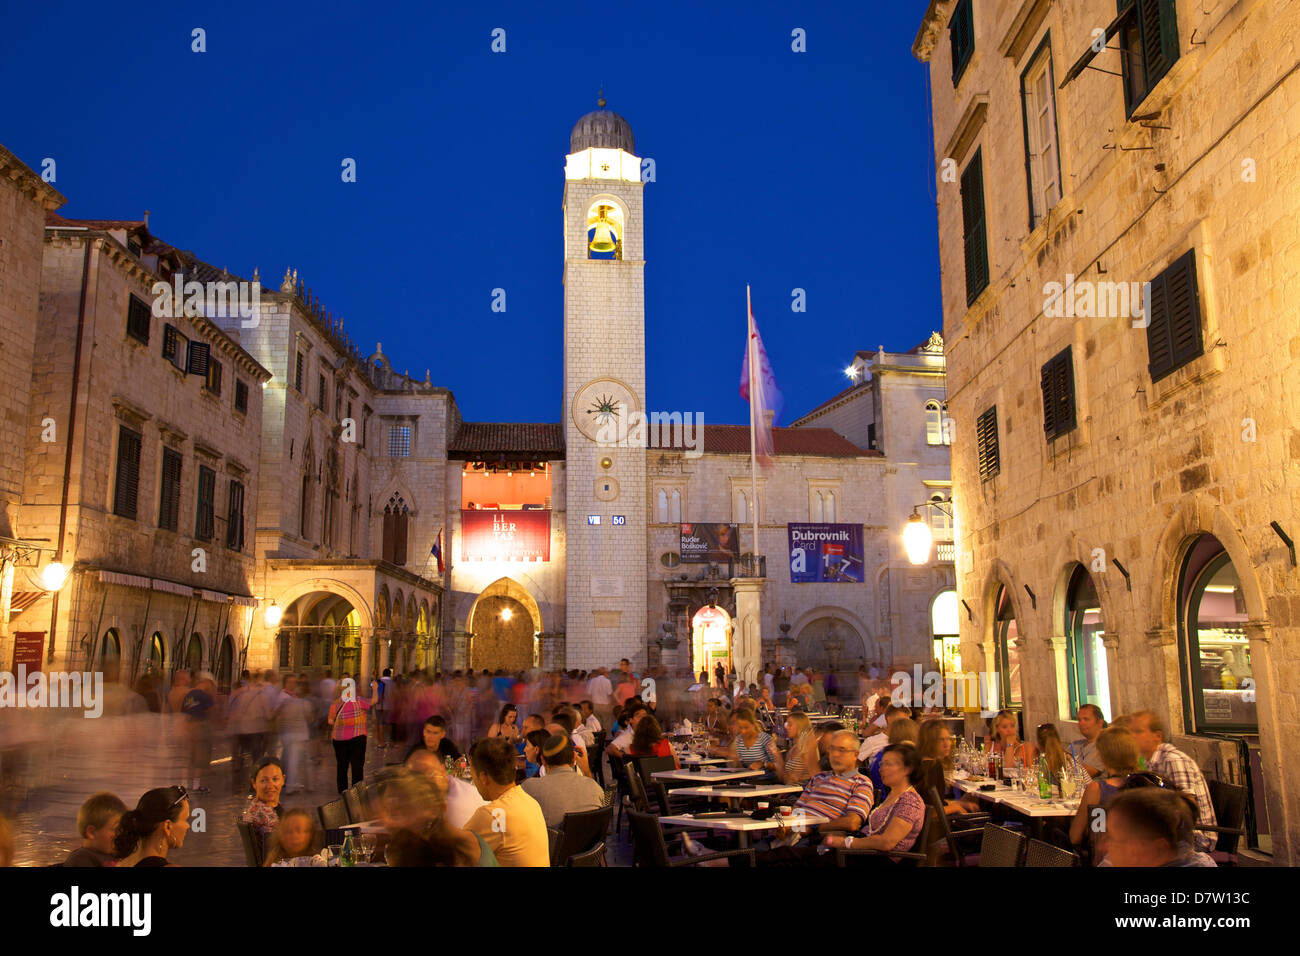 Restaurants, Clock Tower and Stradun, Dubrovnik, Croatia - Stock Image